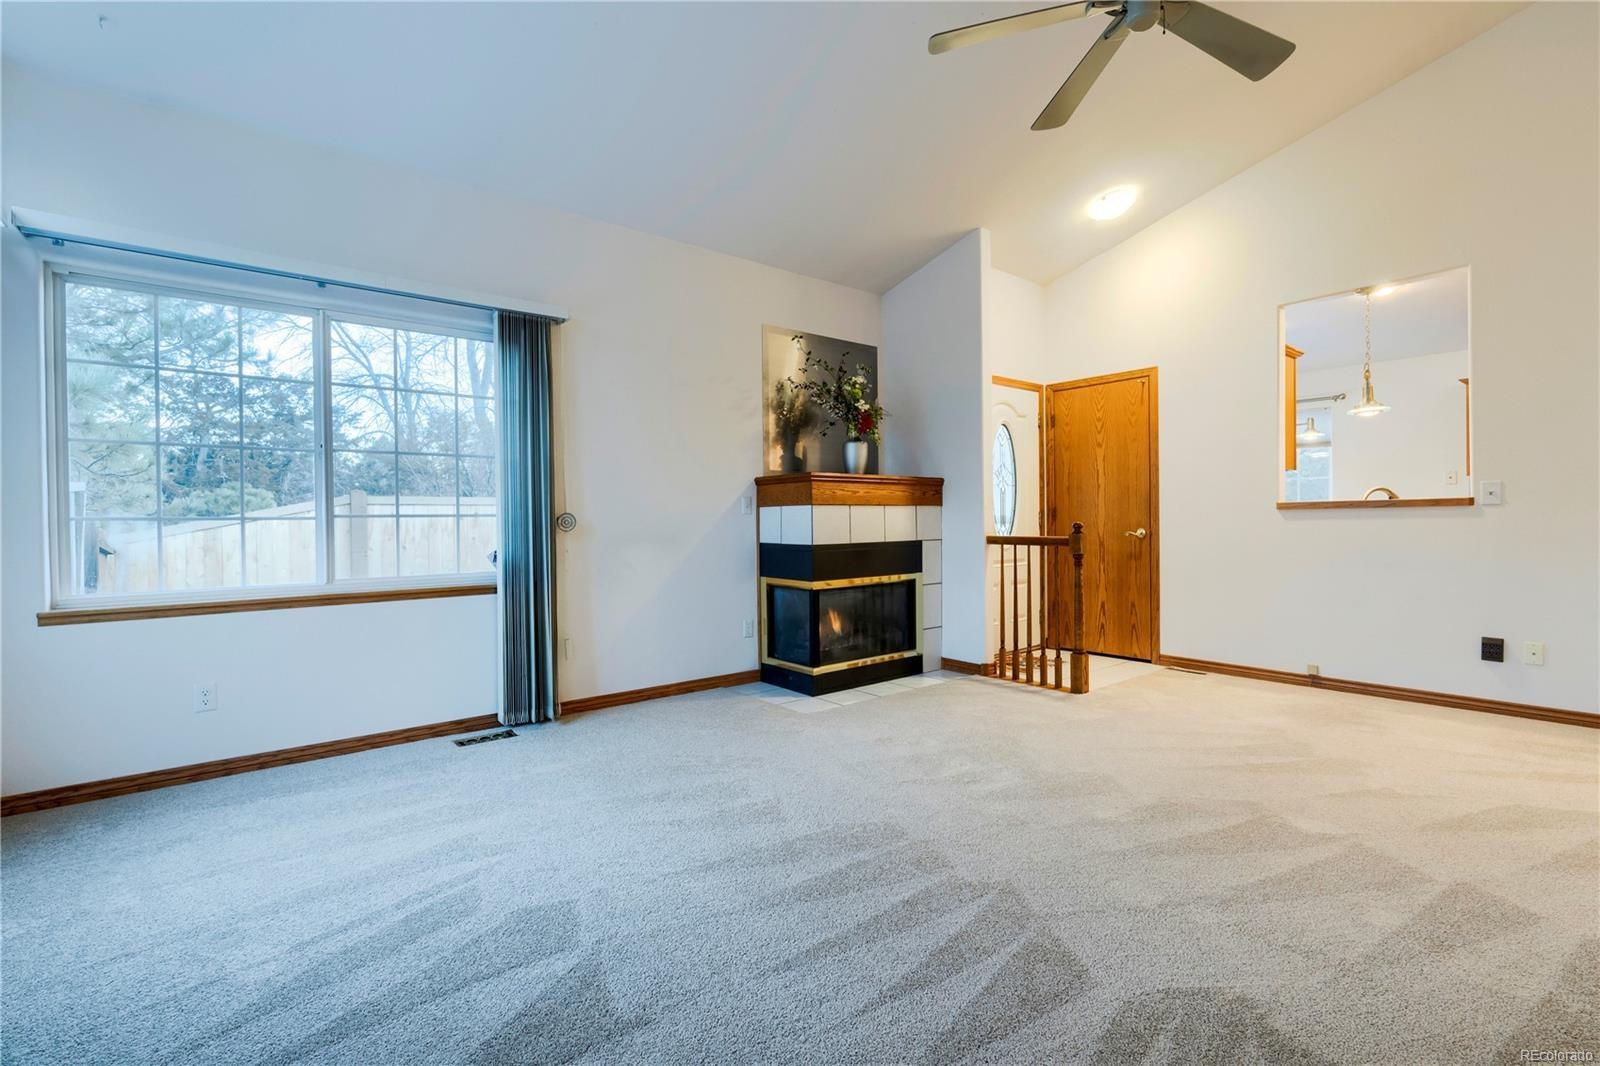 MLS# 7511958 - 5 - 900 Arbor Avenue #6, Fort Collins, CO 80526